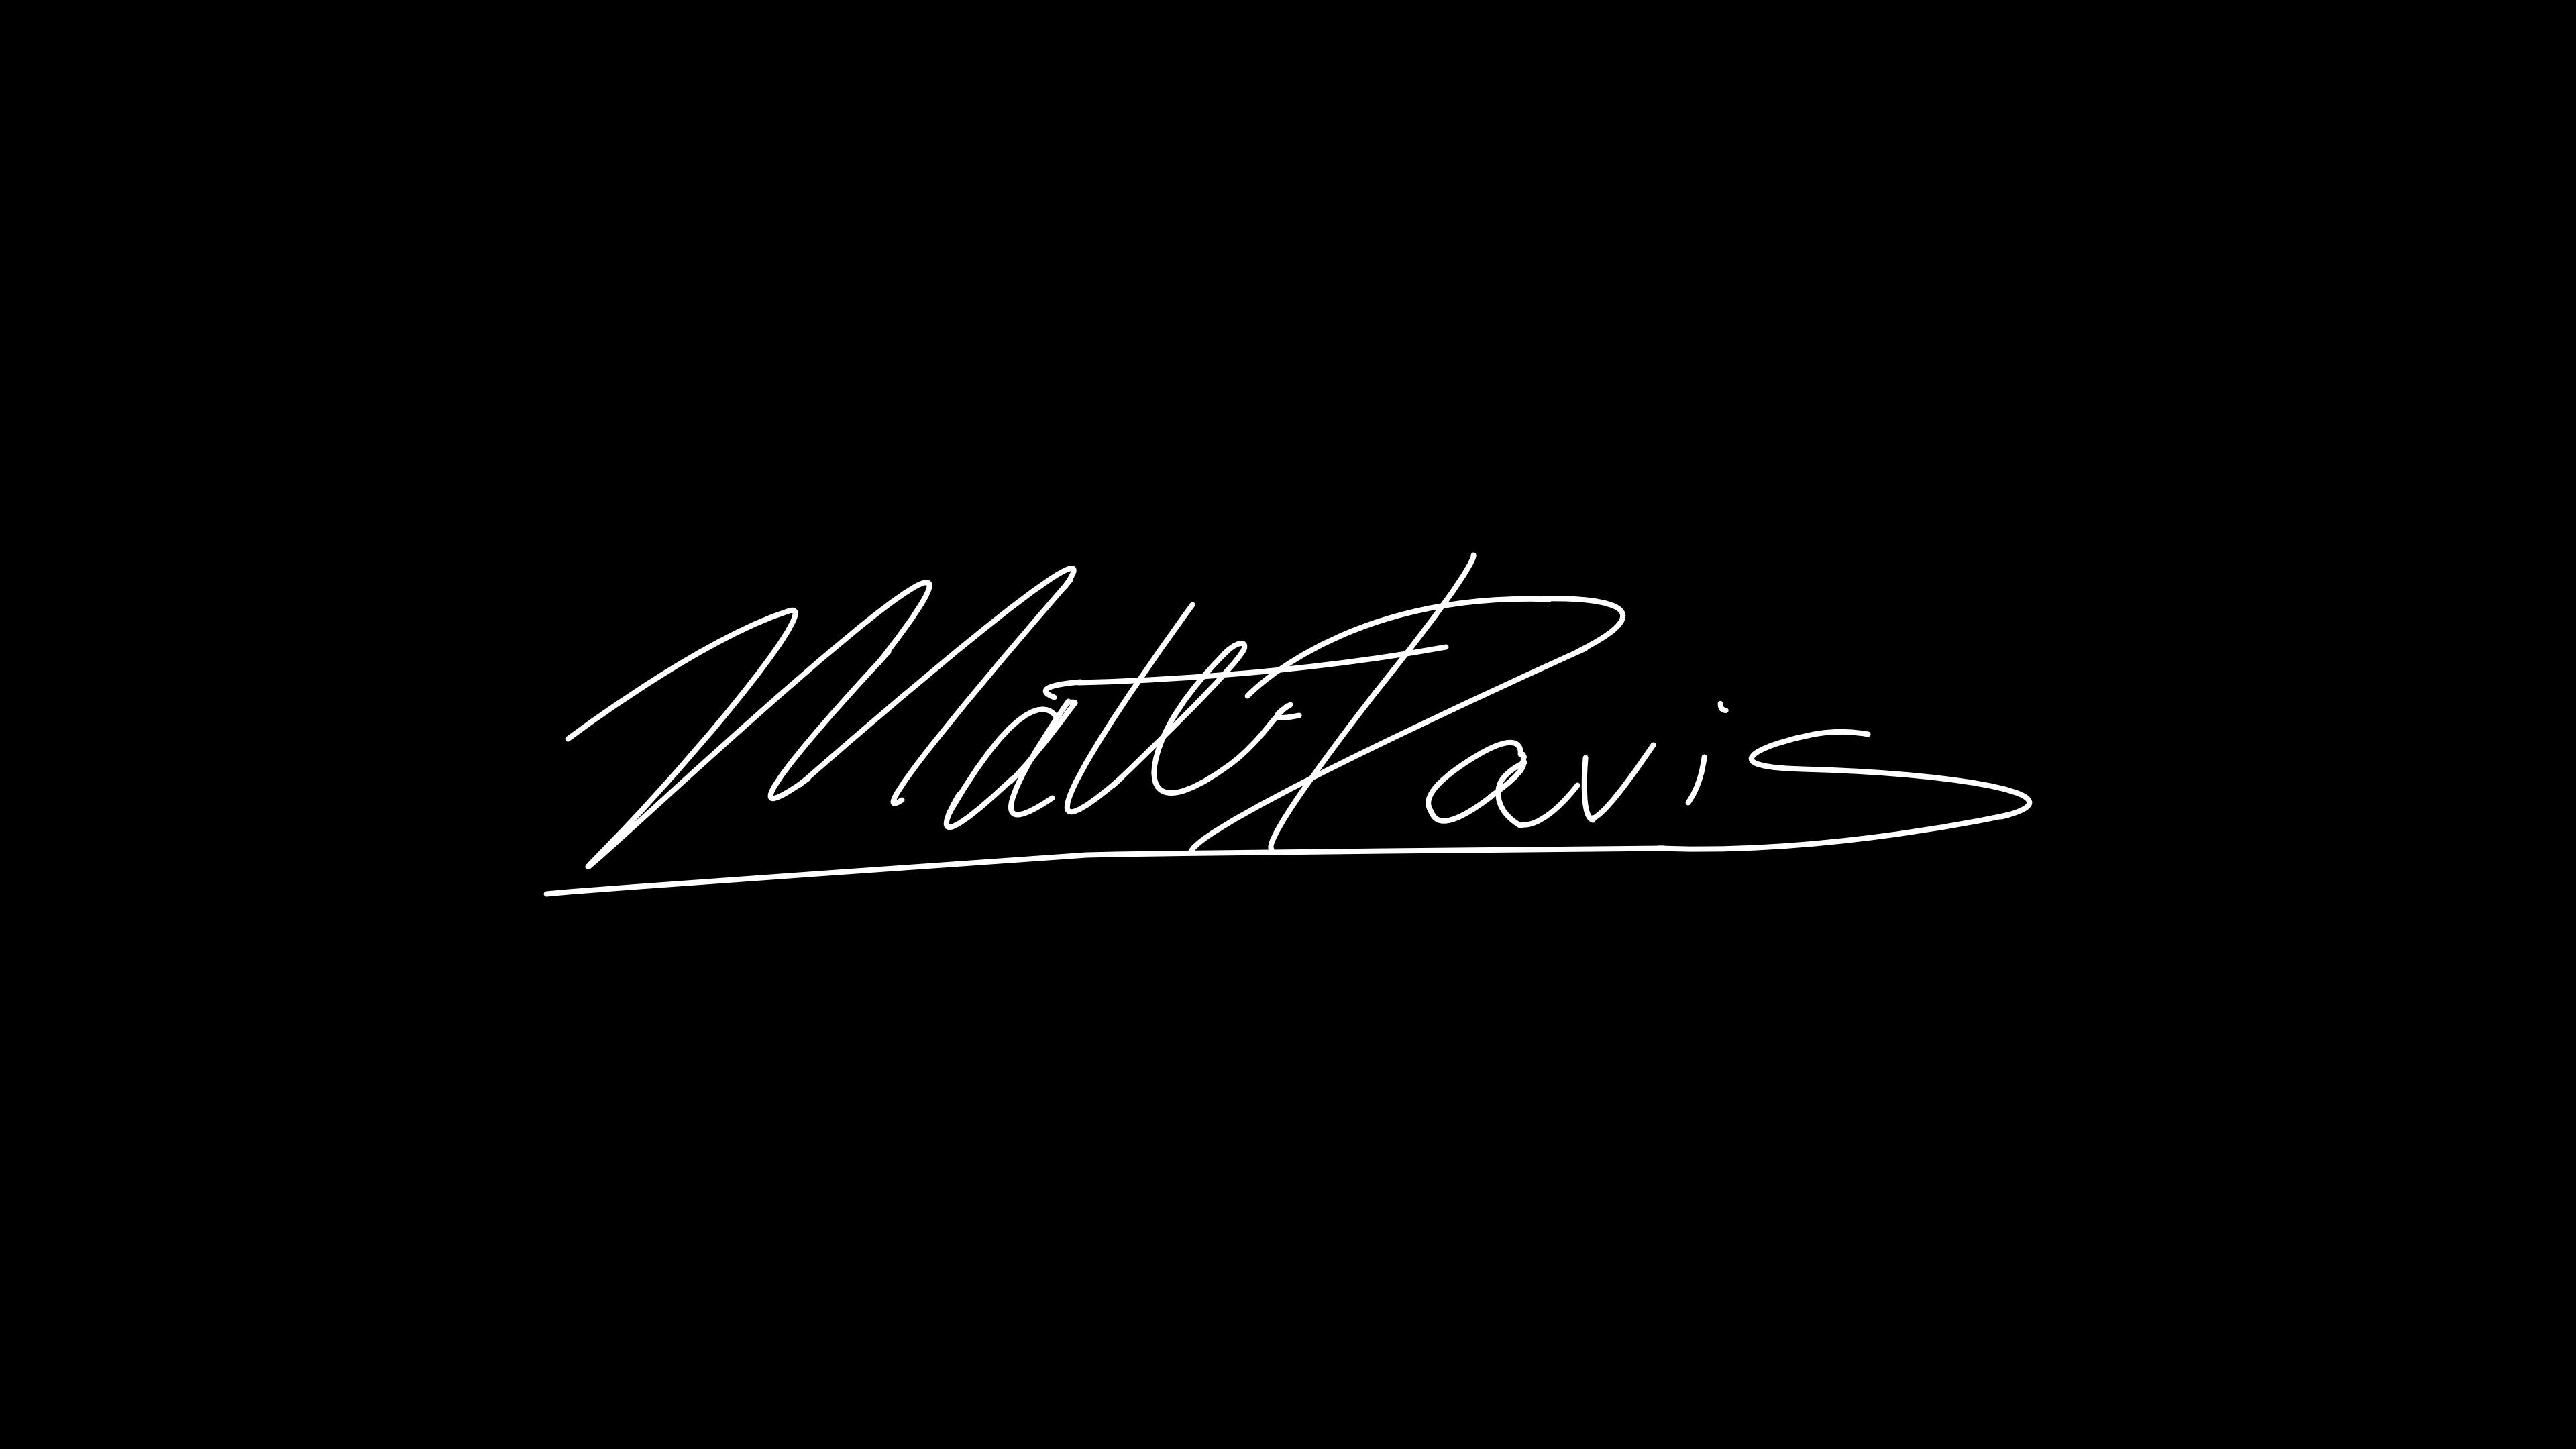 Matt Davis's Signature